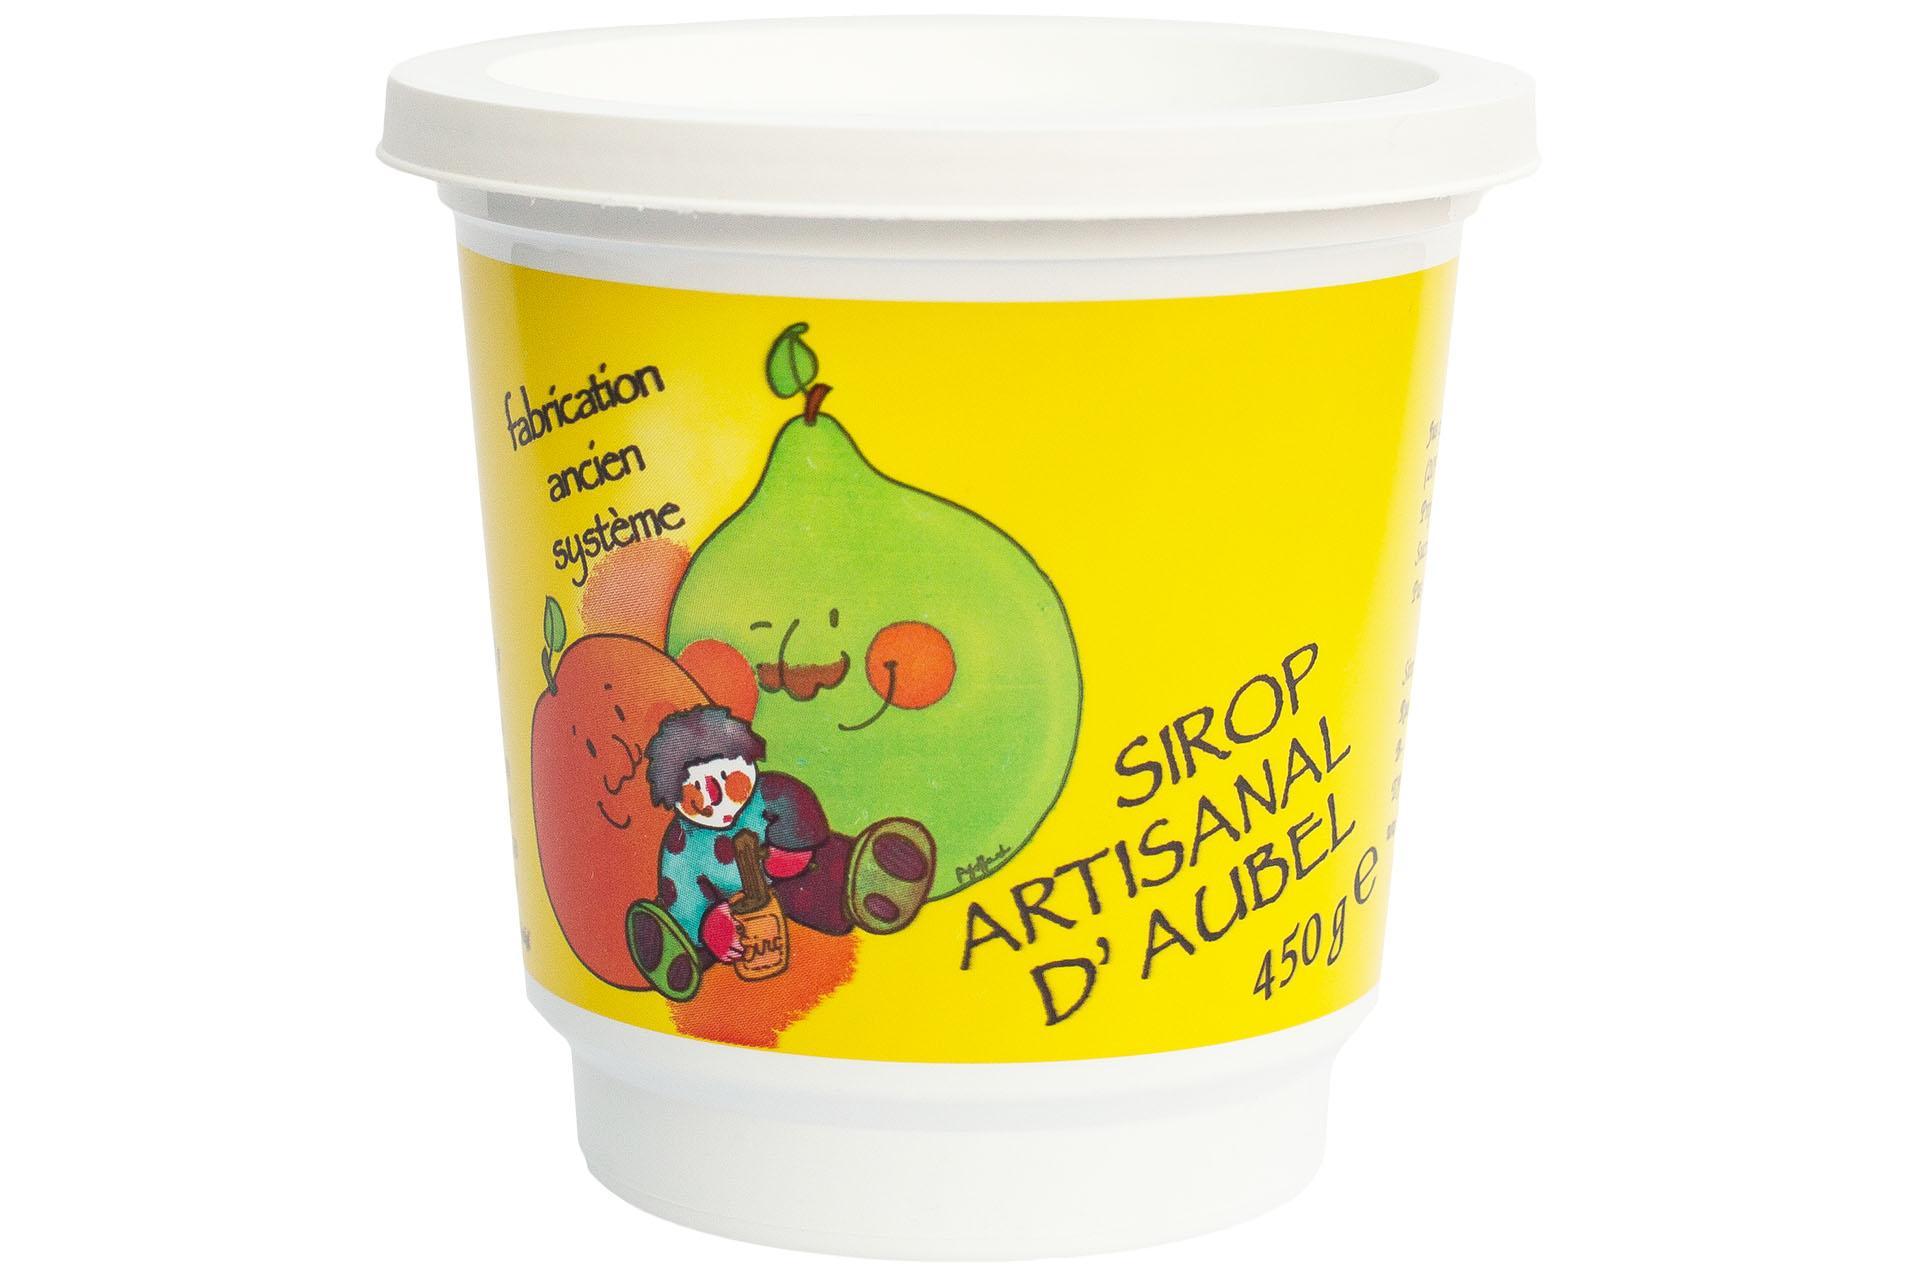 Siroperie Artisanale D'Aubel - Pot de sirop